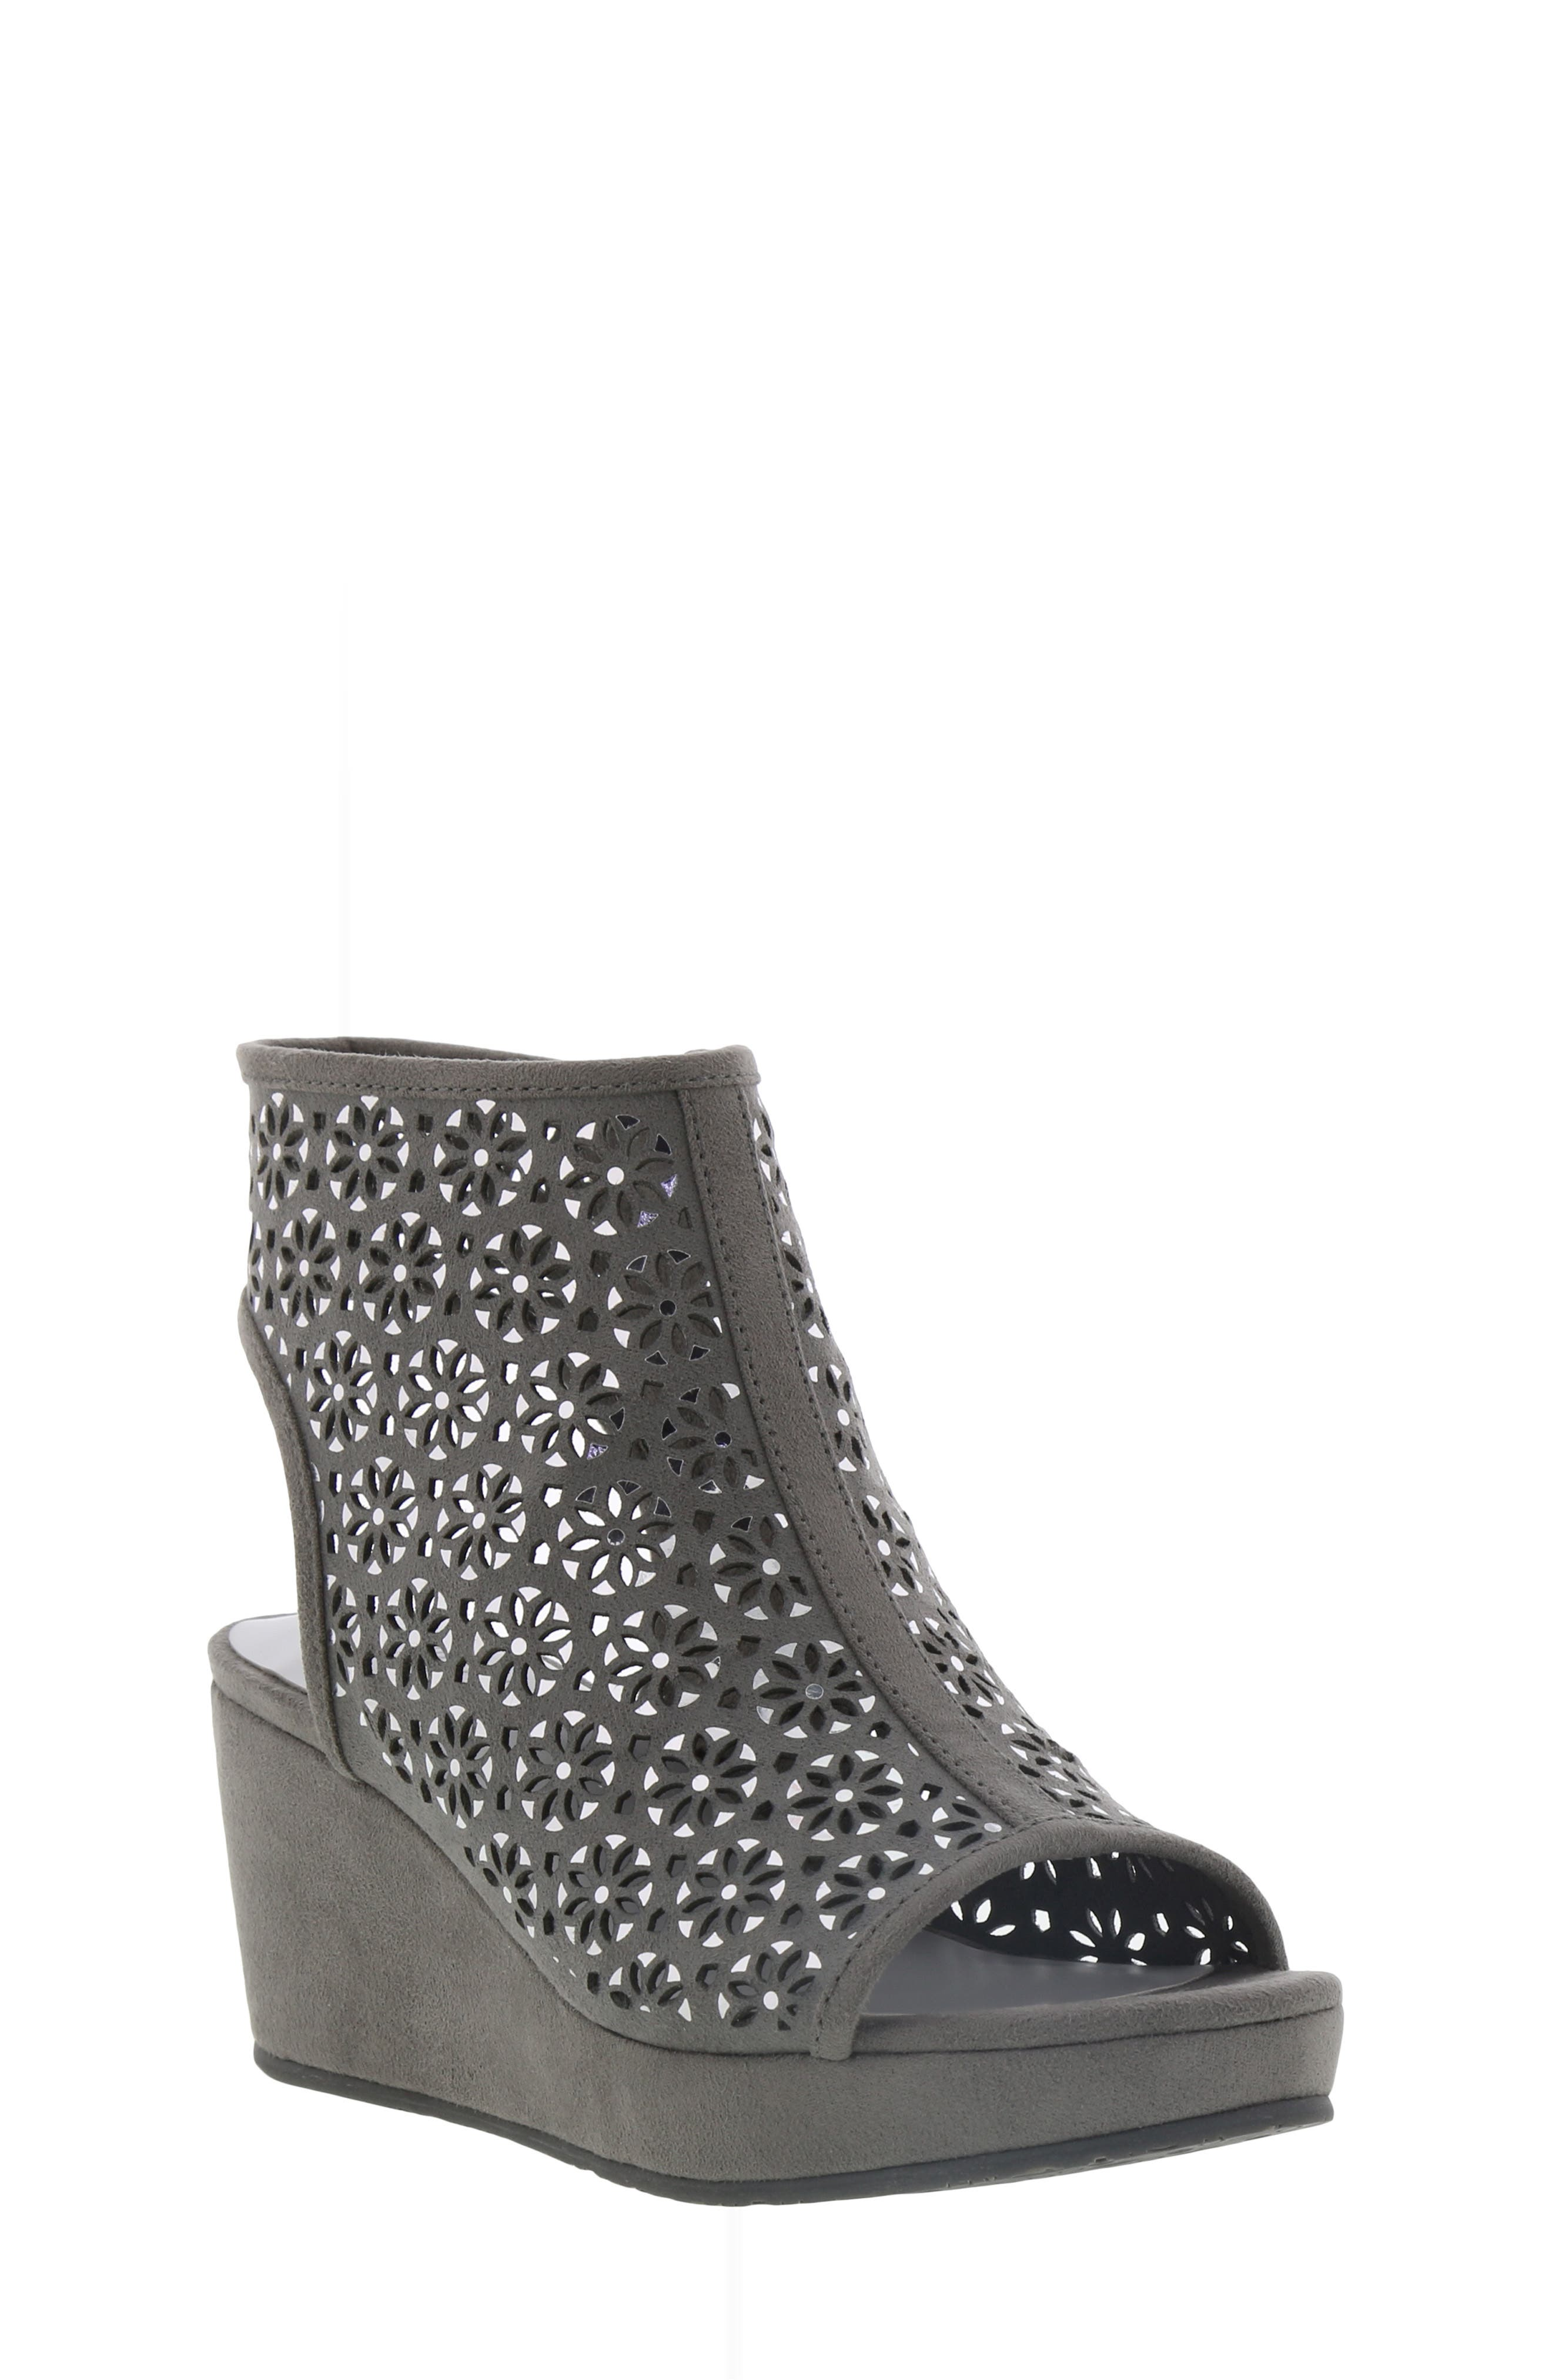 Image of Kenneth Cole New York Corrine Hazel Platform Wedge Sandal